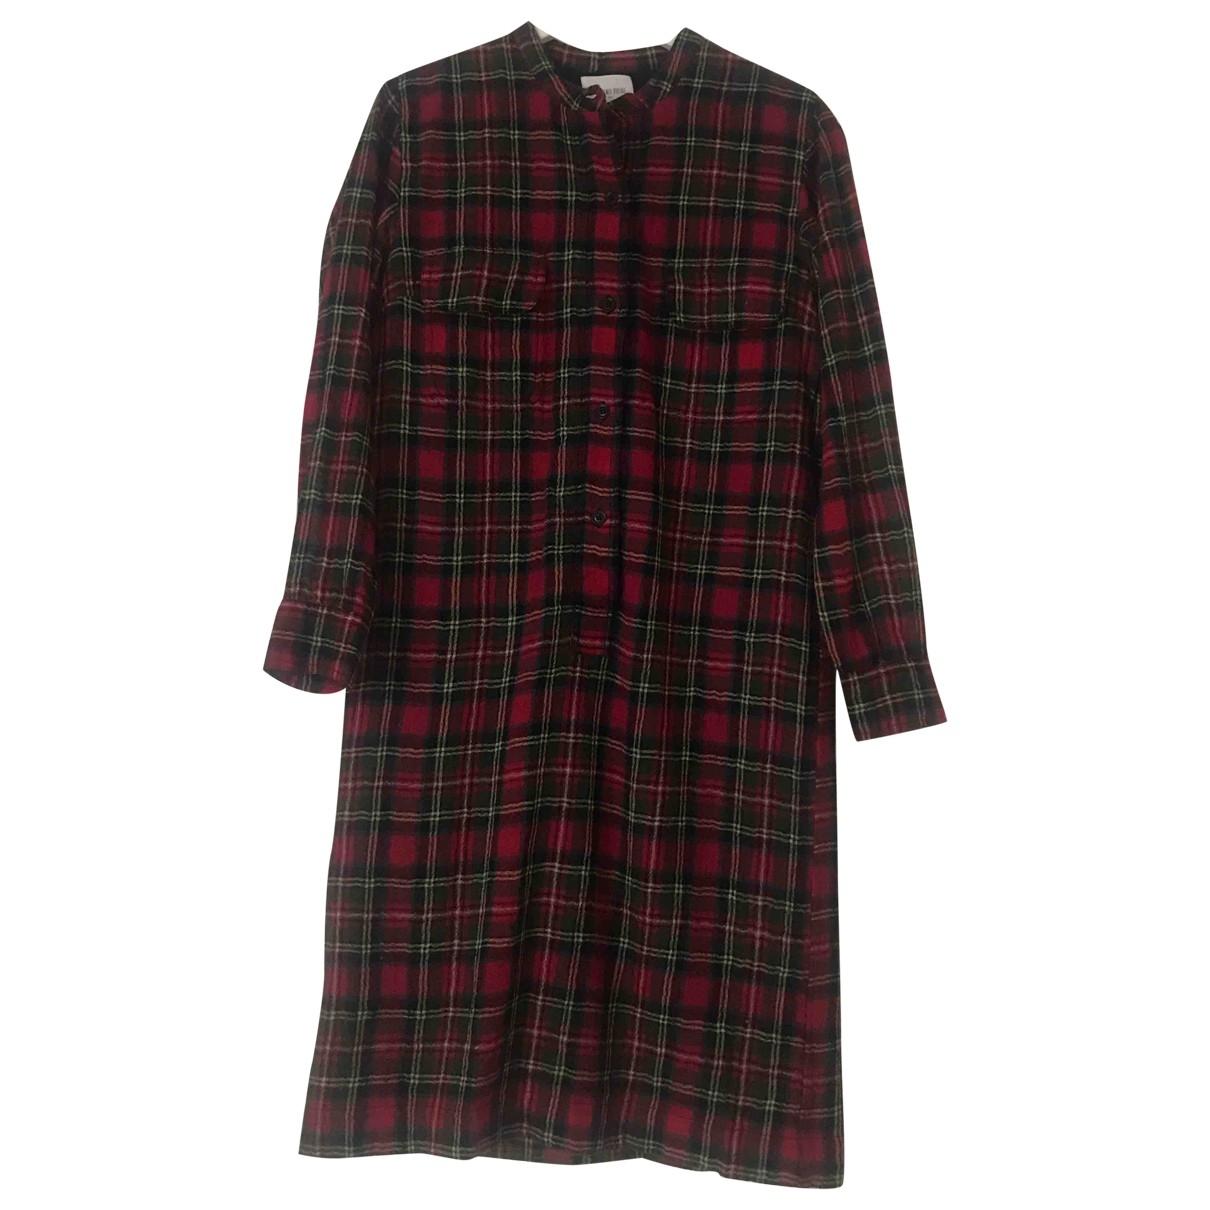 Laurence Dolige \N Red Wool dress for Women 36 FR